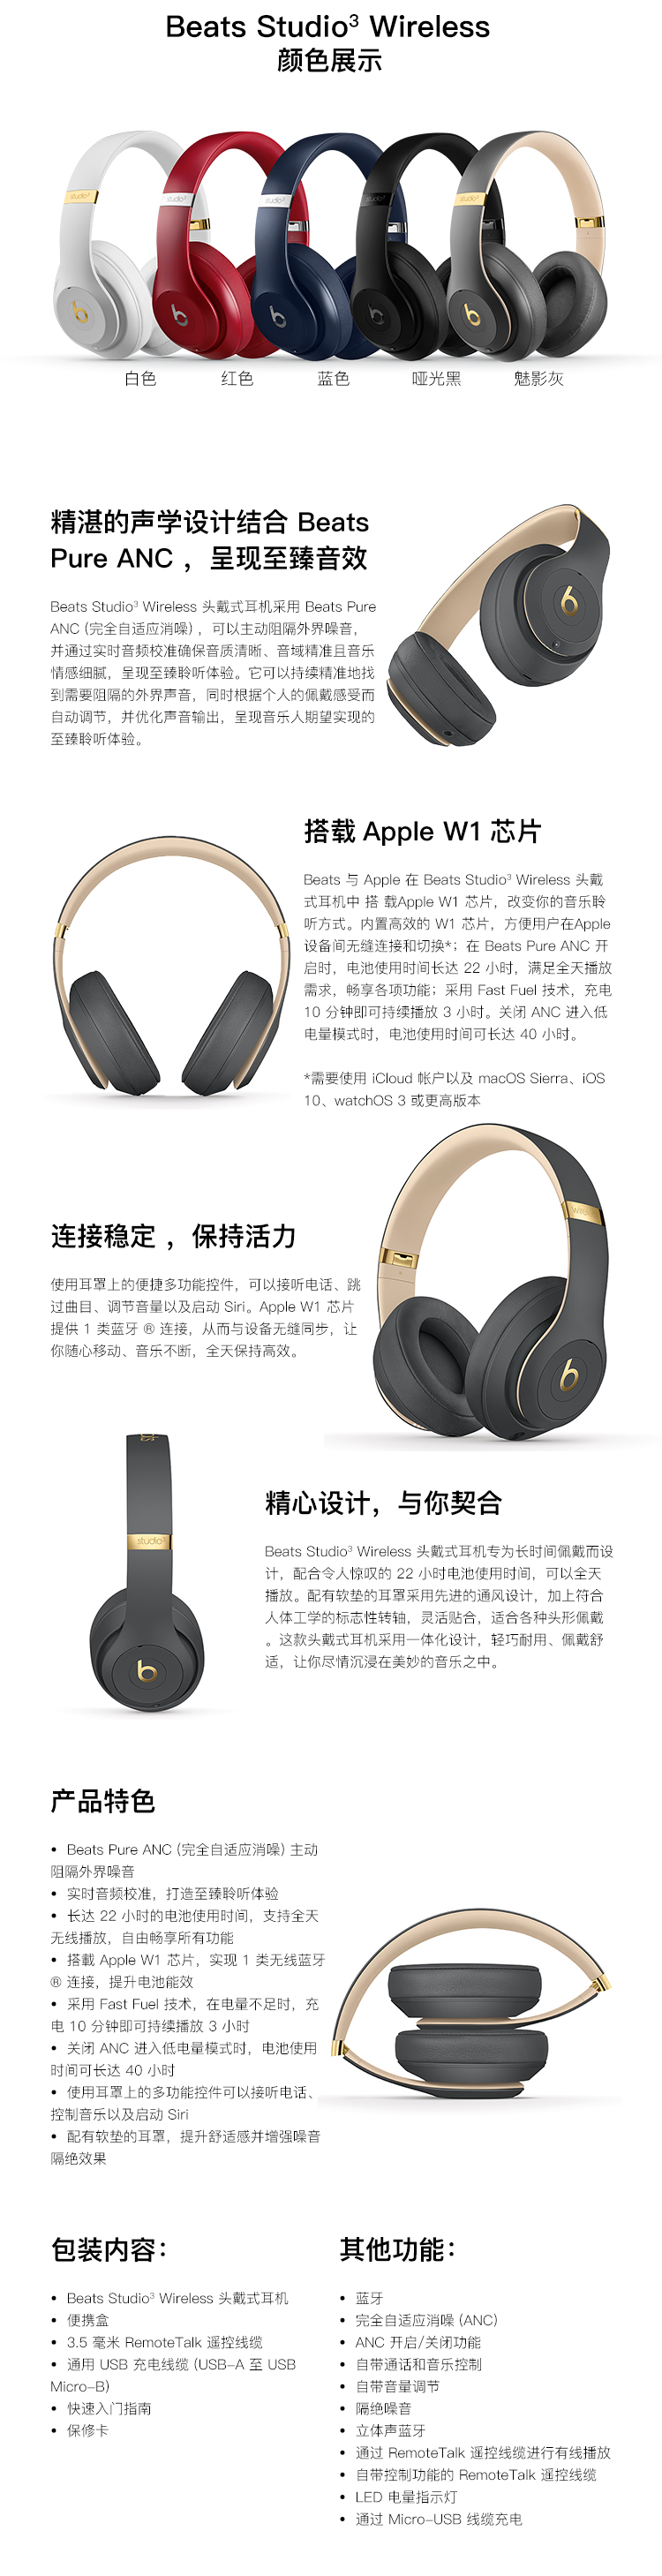 Beats Studio3 Wireless 录音师无线3代